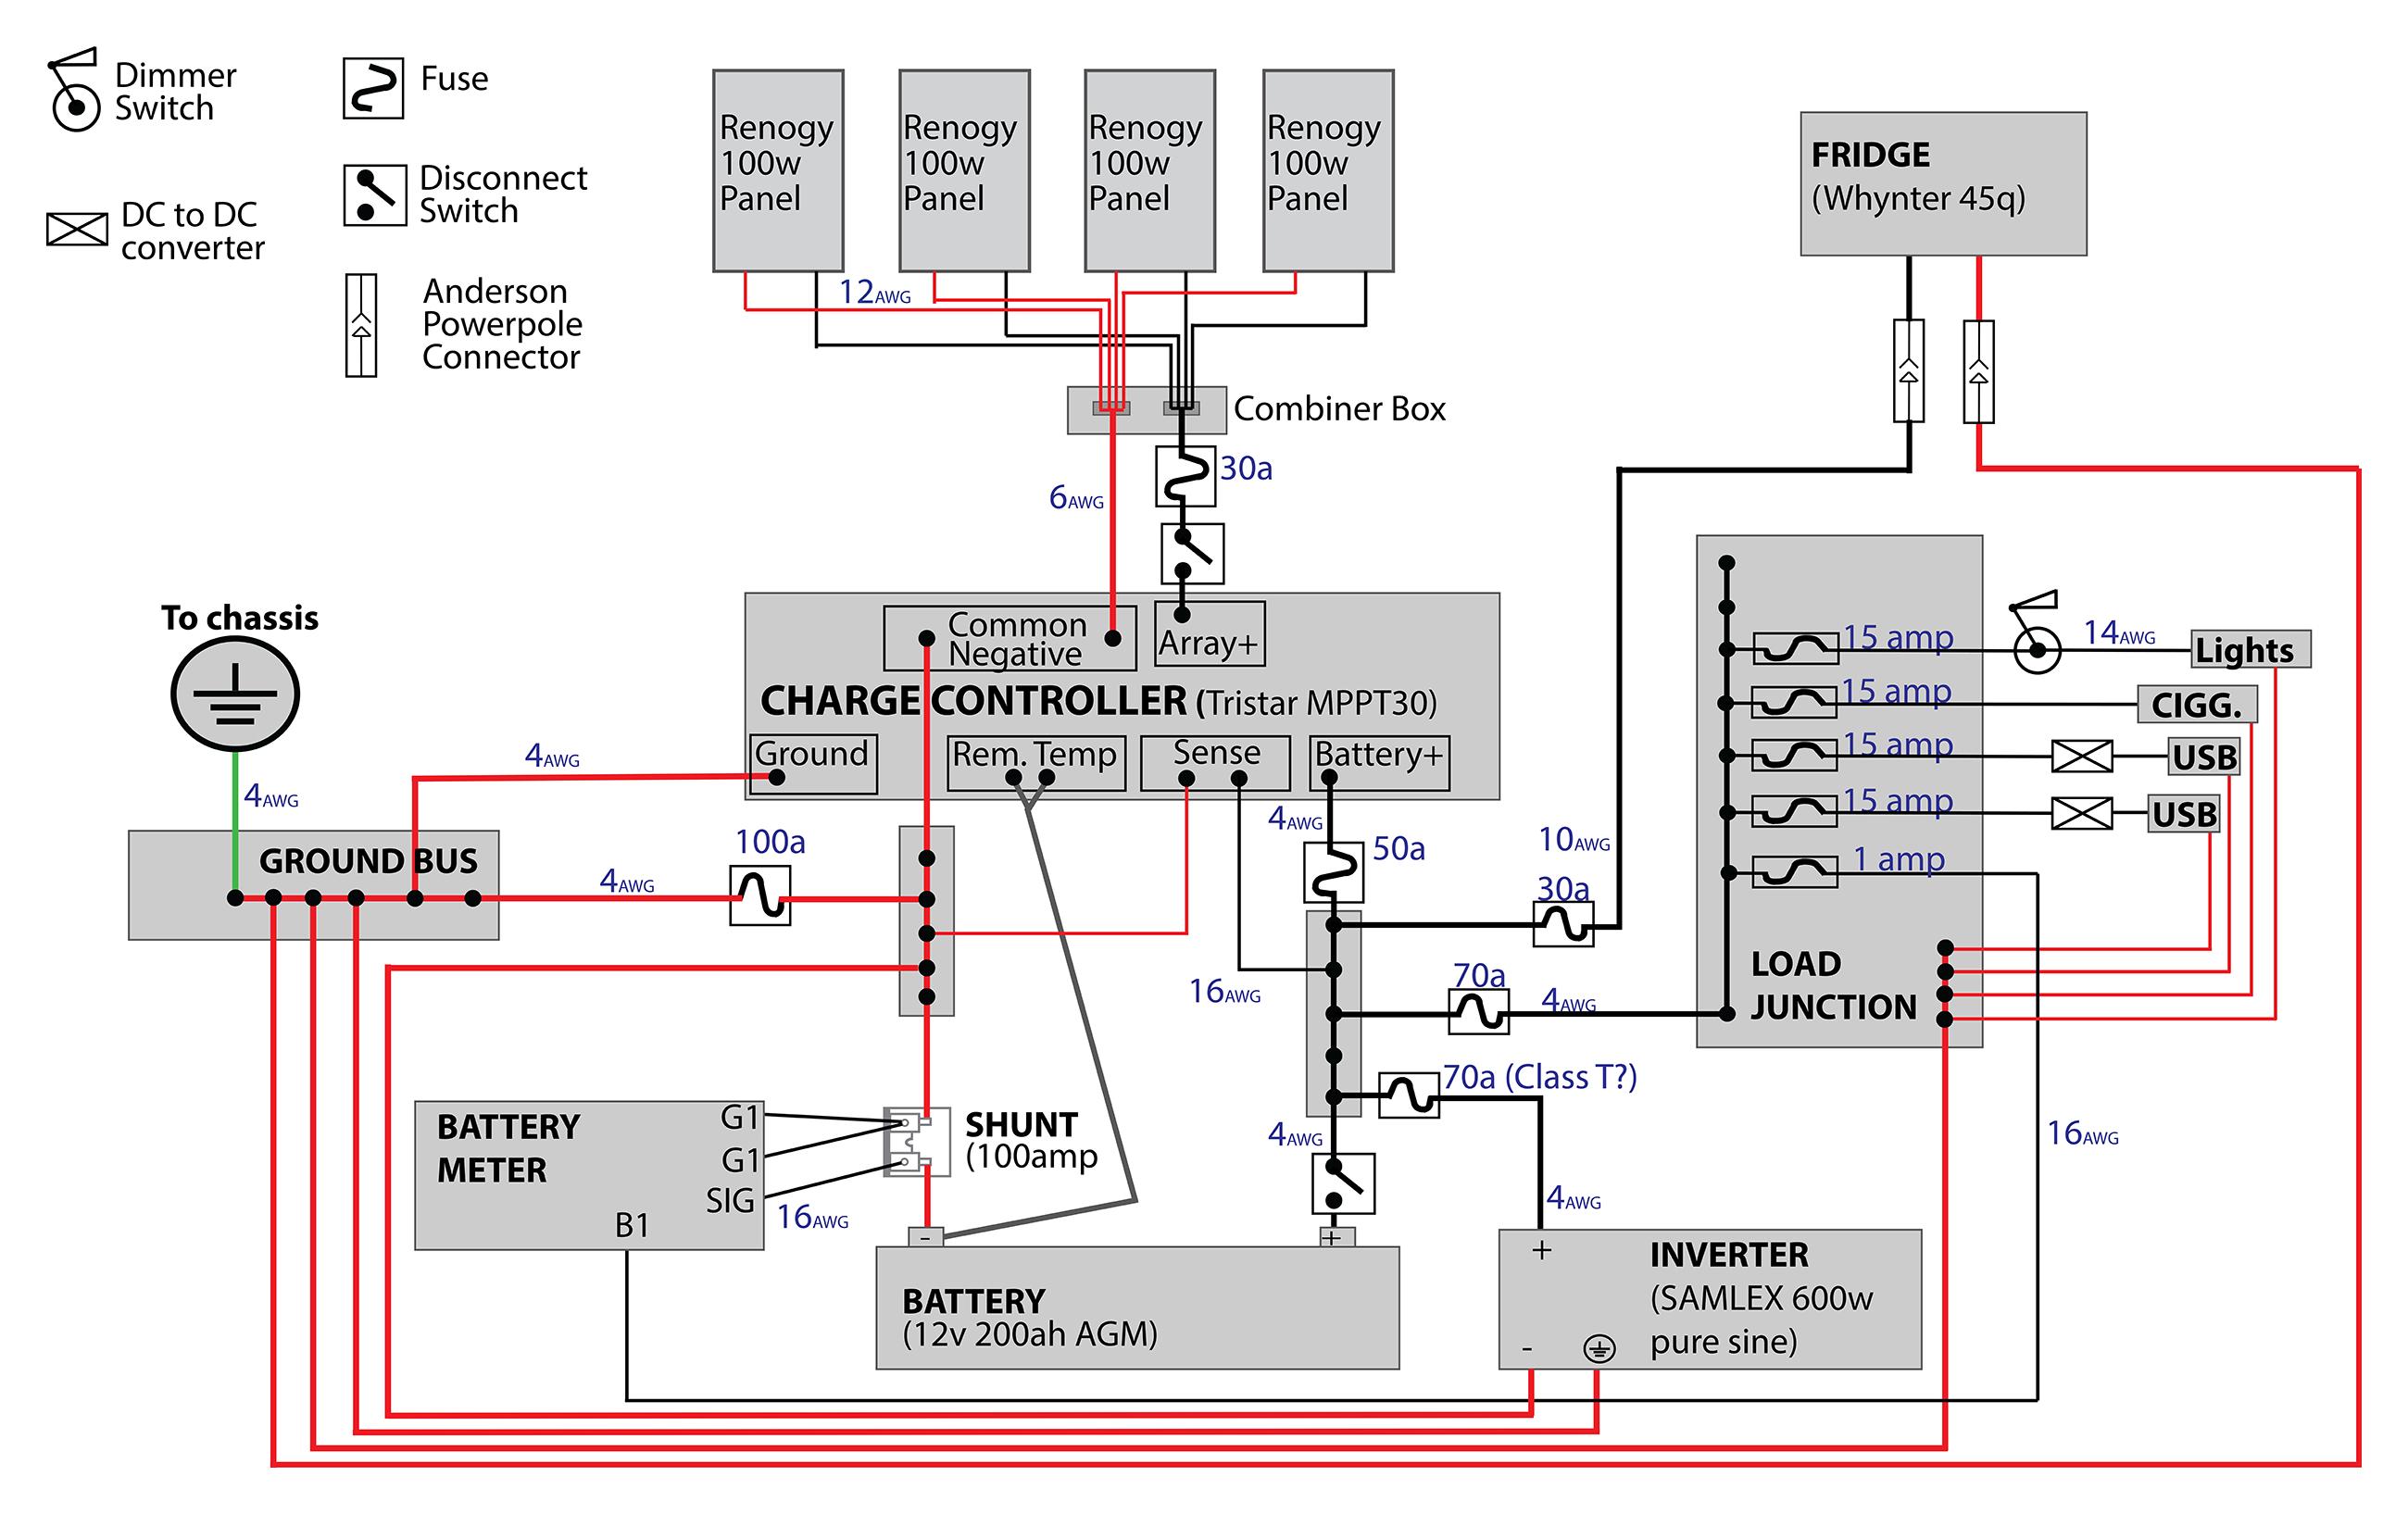 Admirable Renogy Wiring Diagram Wirings Diagram Wiring Cloud Hisonuggs Outletorg